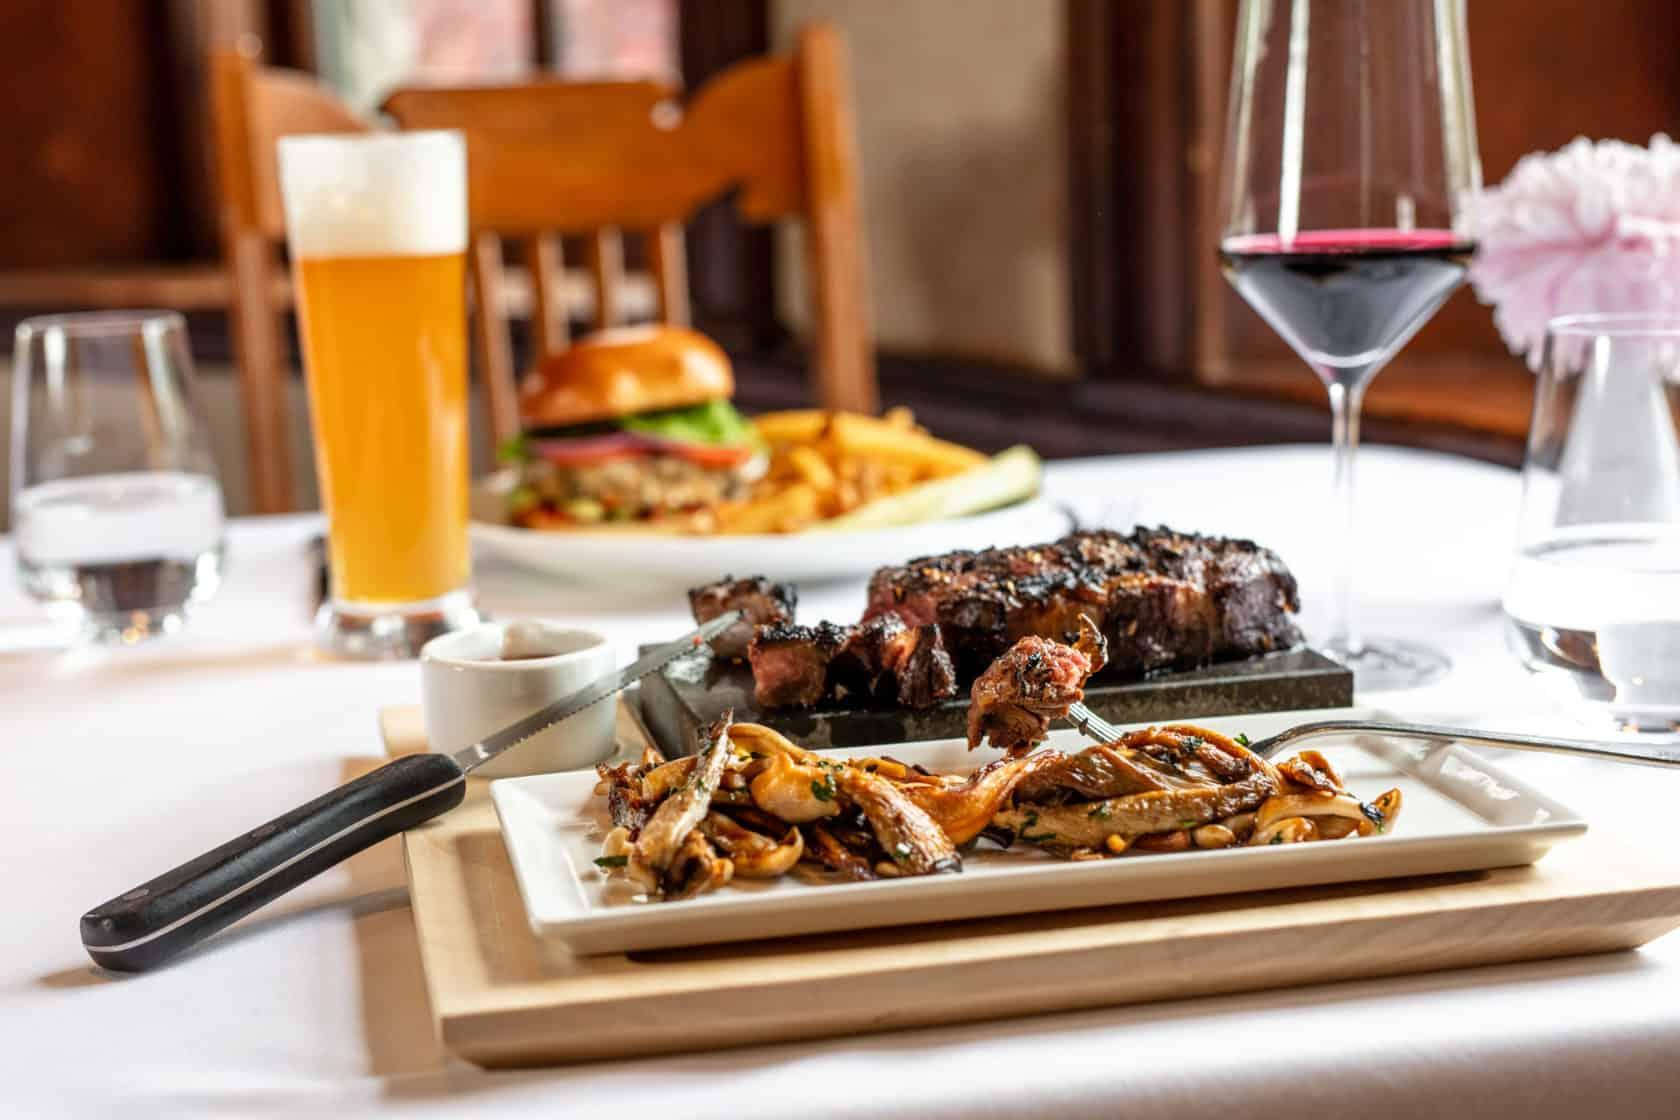 Mohonk Main Dining Room Steak Dish